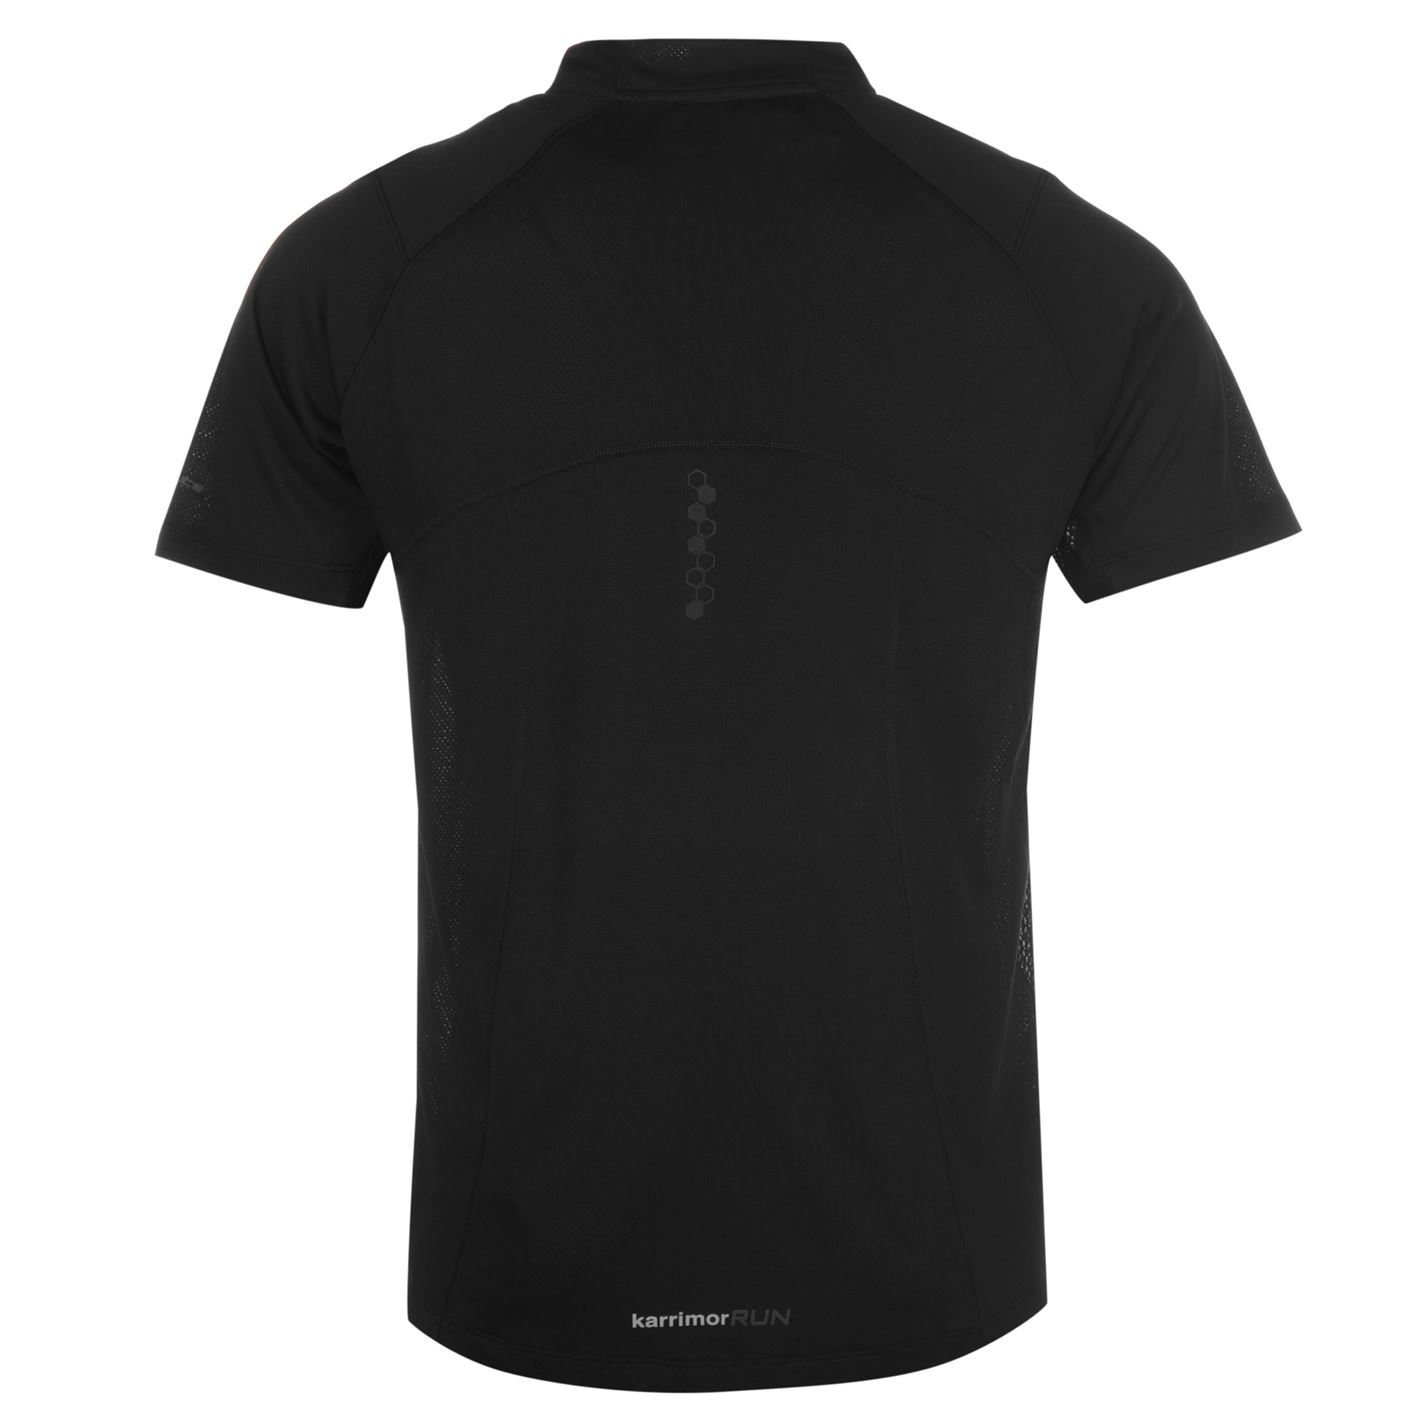 Karrimor-Correr-Mens-X-Cremallera-Camiseta-Camiseta-Top-Transpirable-Ligero-Mentonera miniatura 9